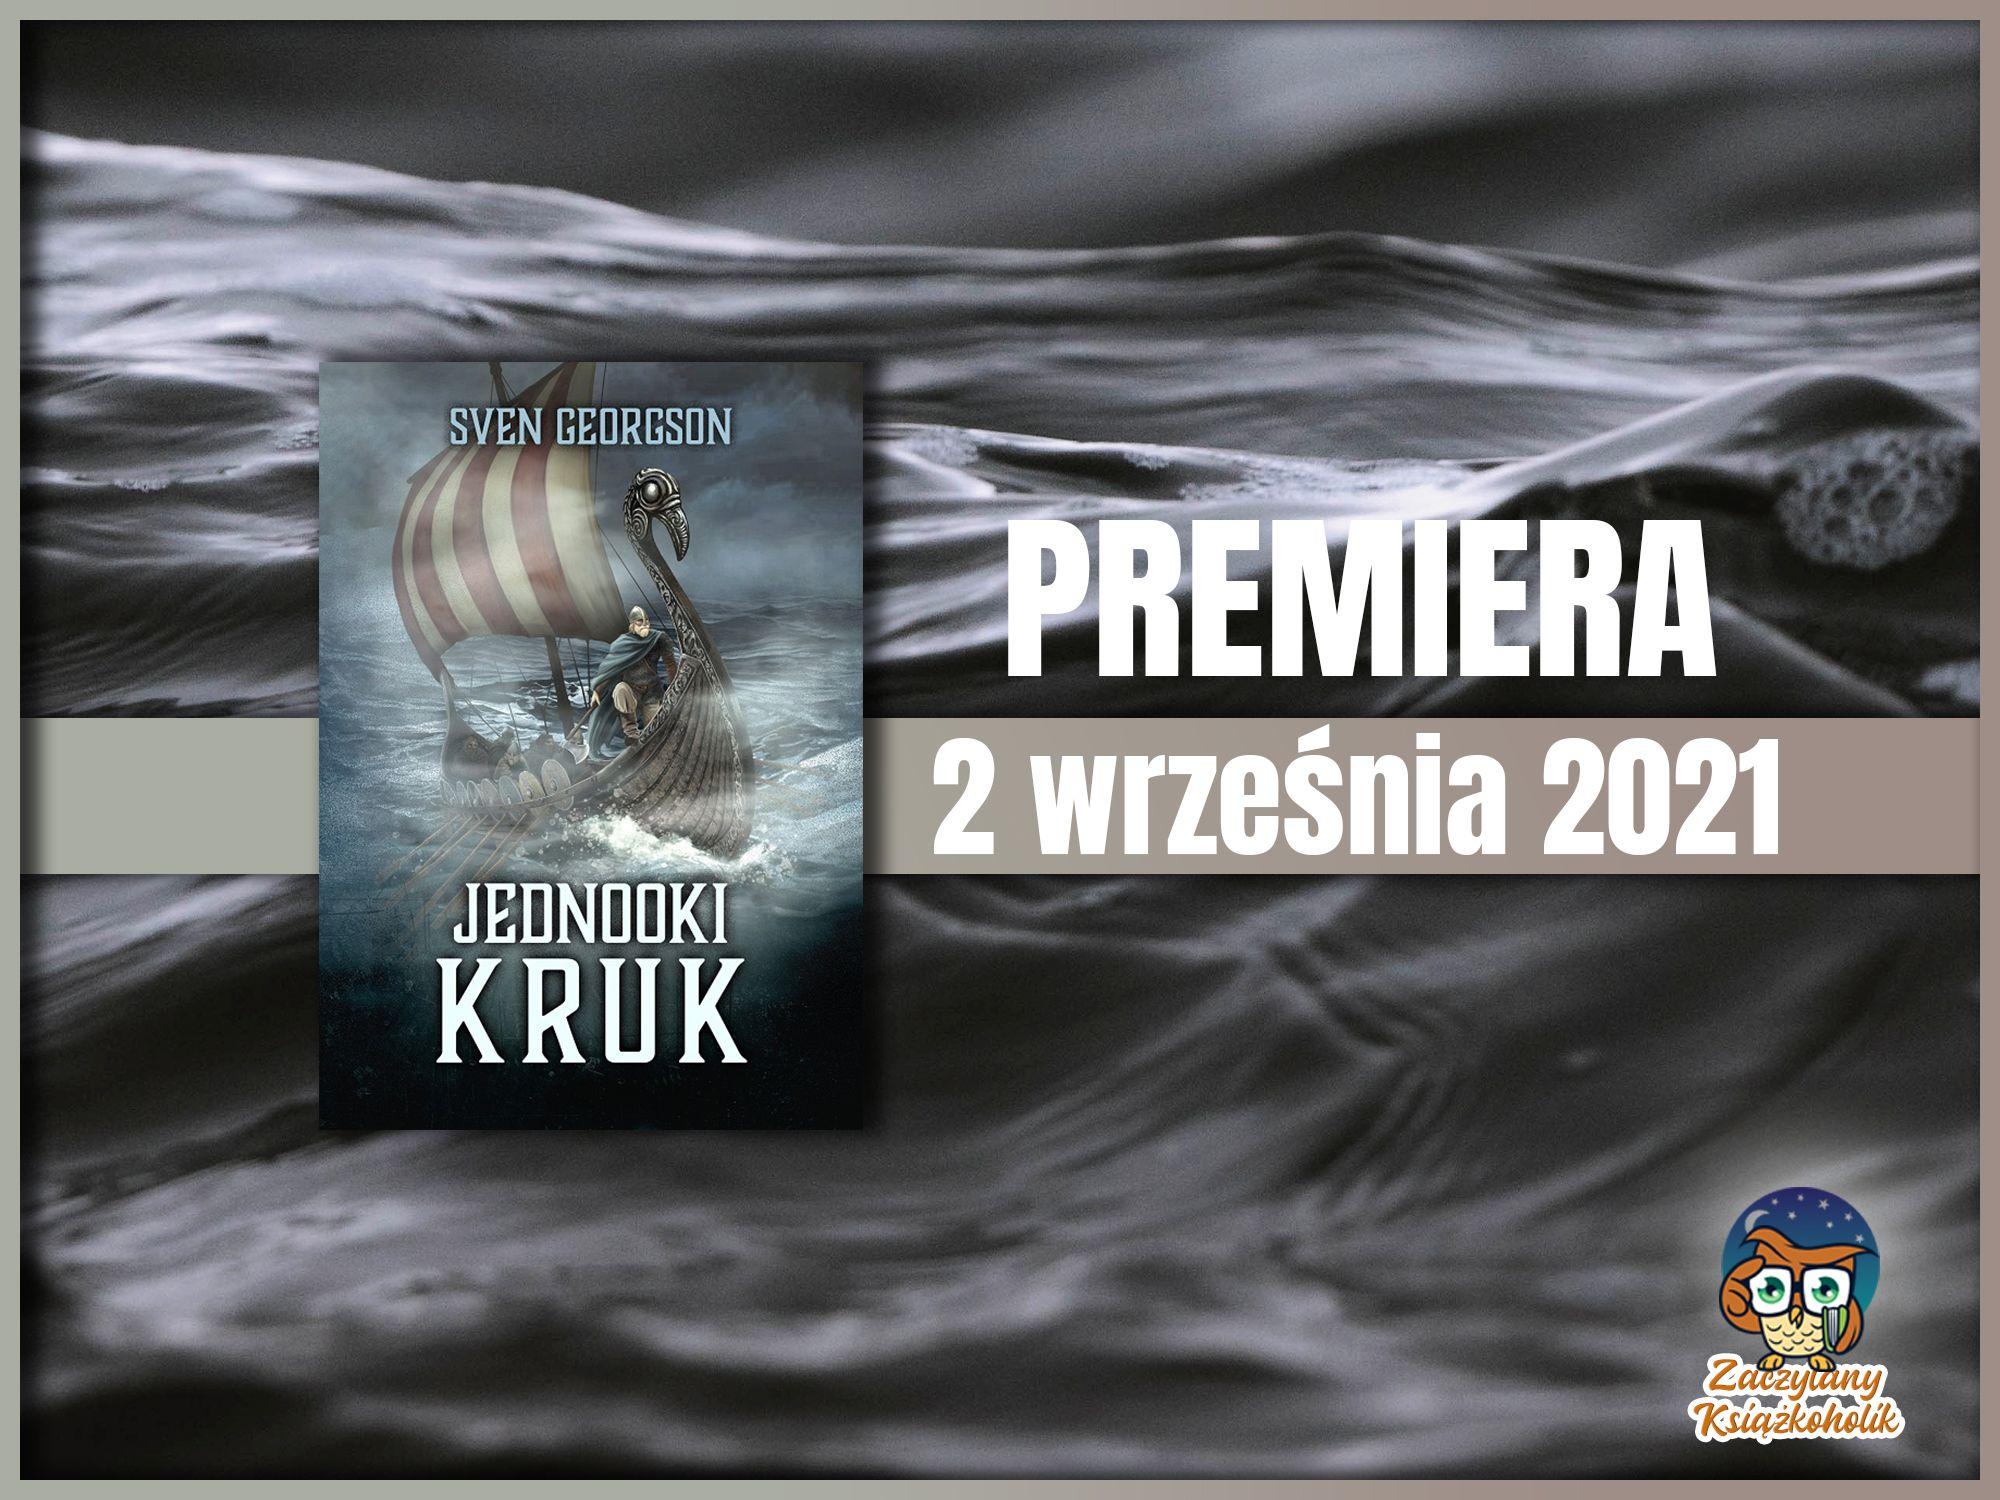 Jednooki kruk, Sven Georgson, zaczytanyksiazkoholik.pl